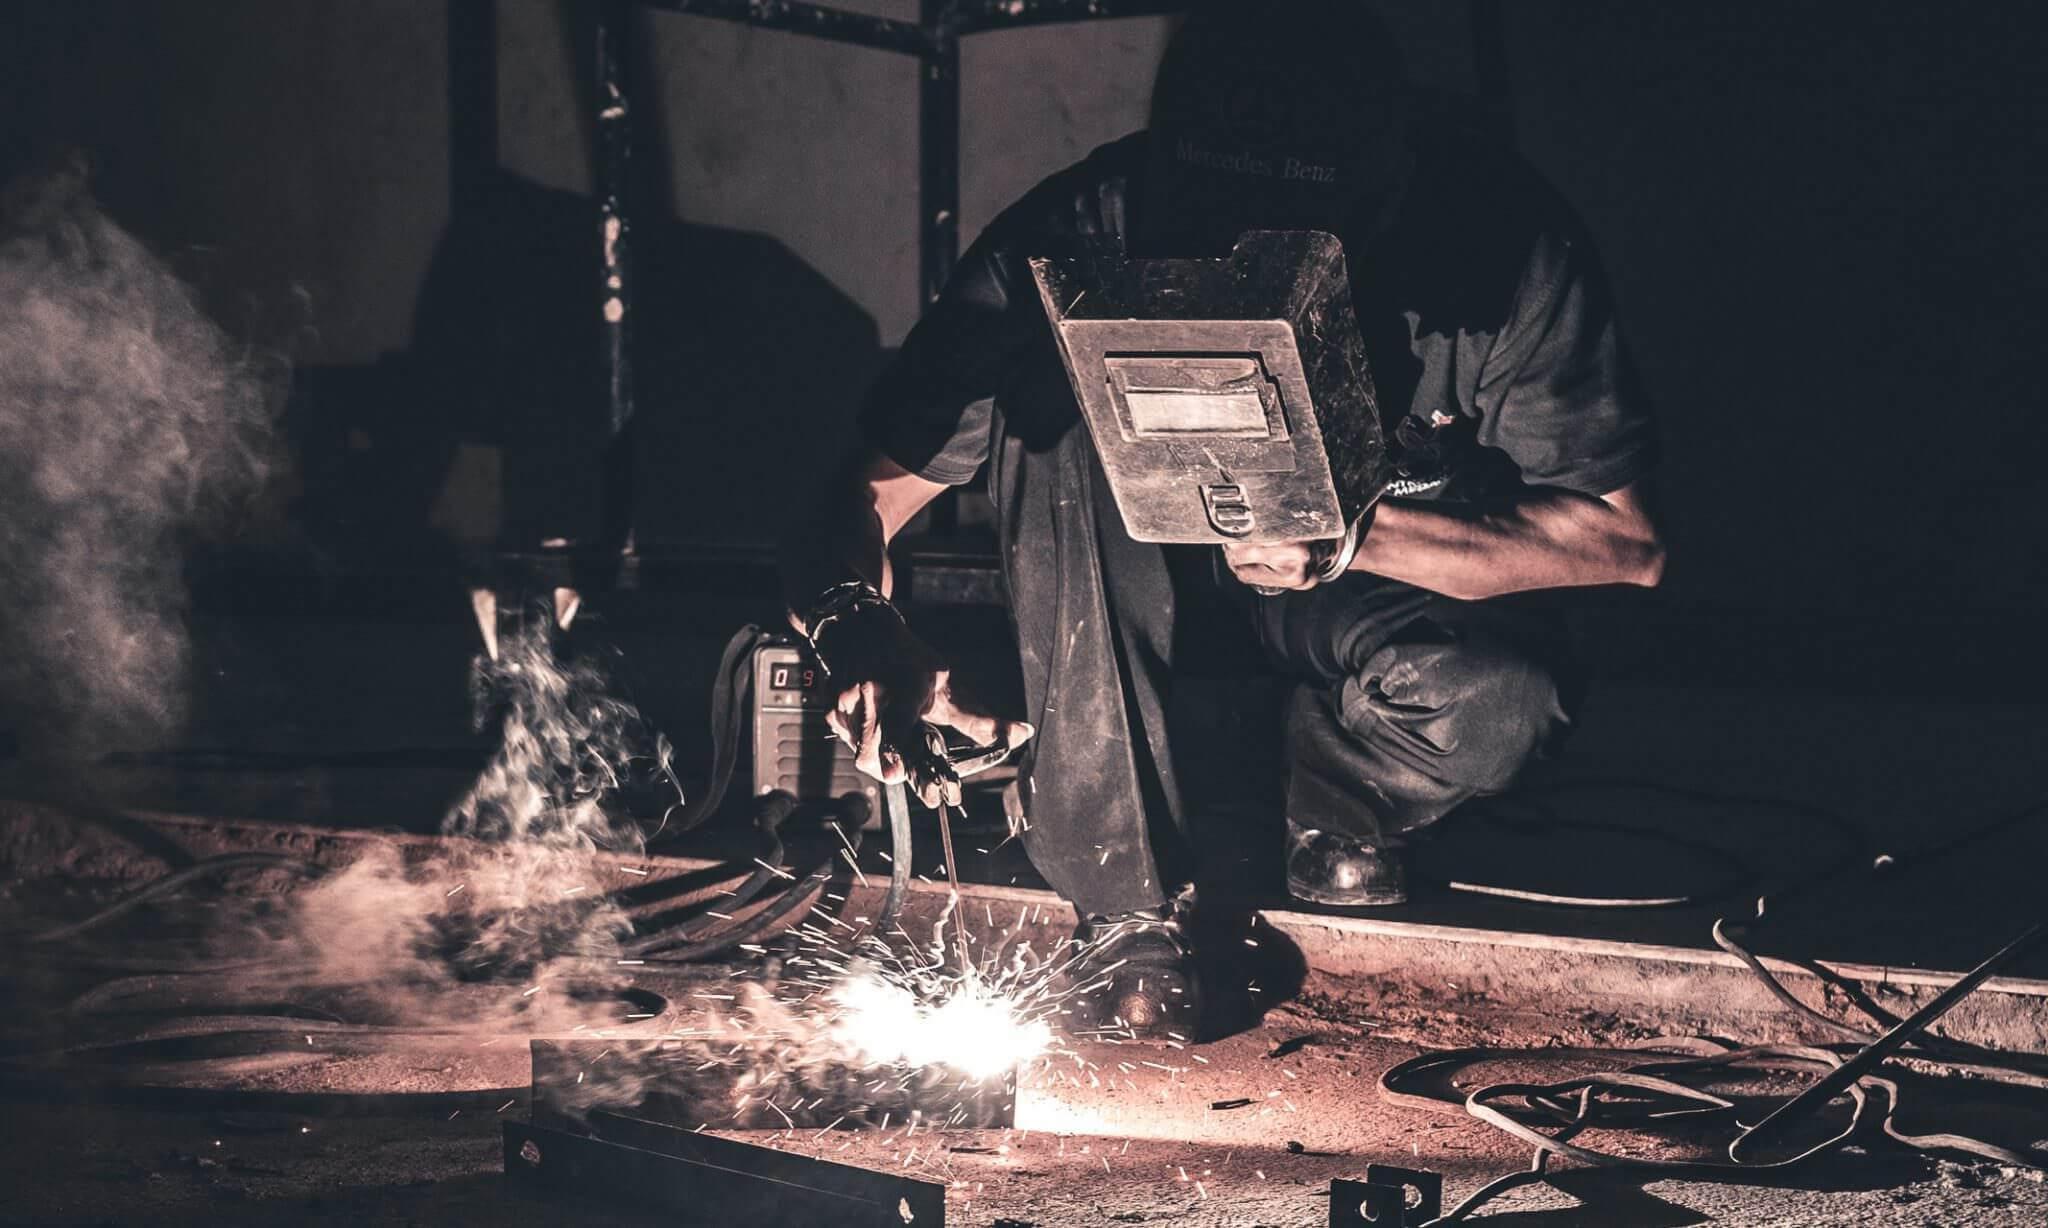 Hacklerregelung wieder abschaffen will Sebastian Kurz 2020